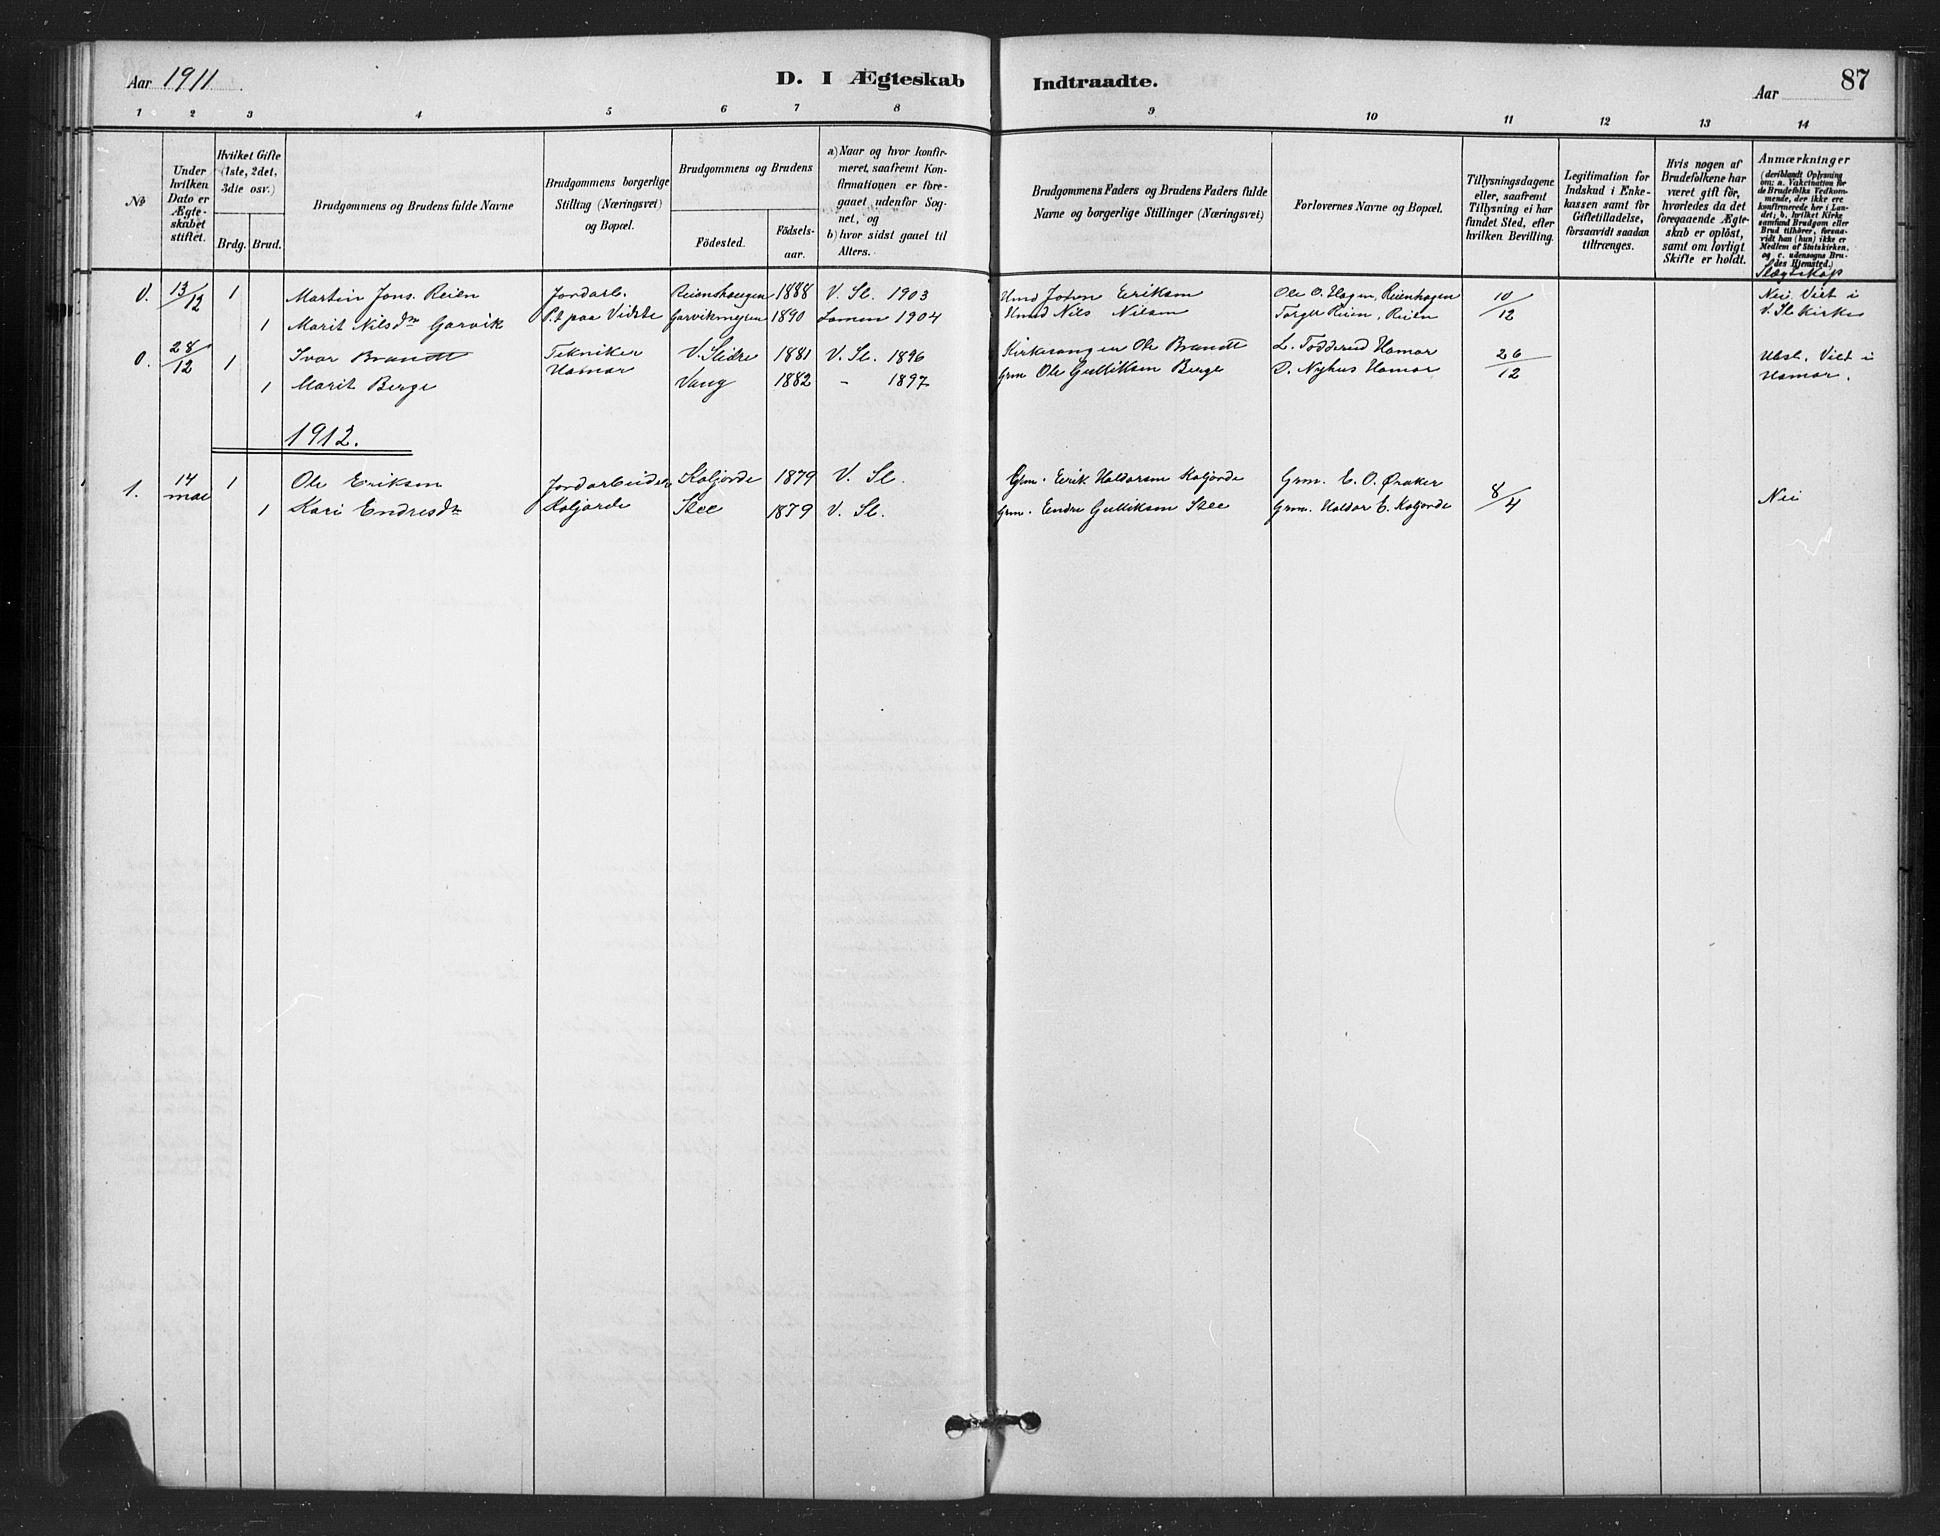 SAH, Vestre Slidre prestekontor, Klokkerbok nr. 6, 1881-1915, s. 87